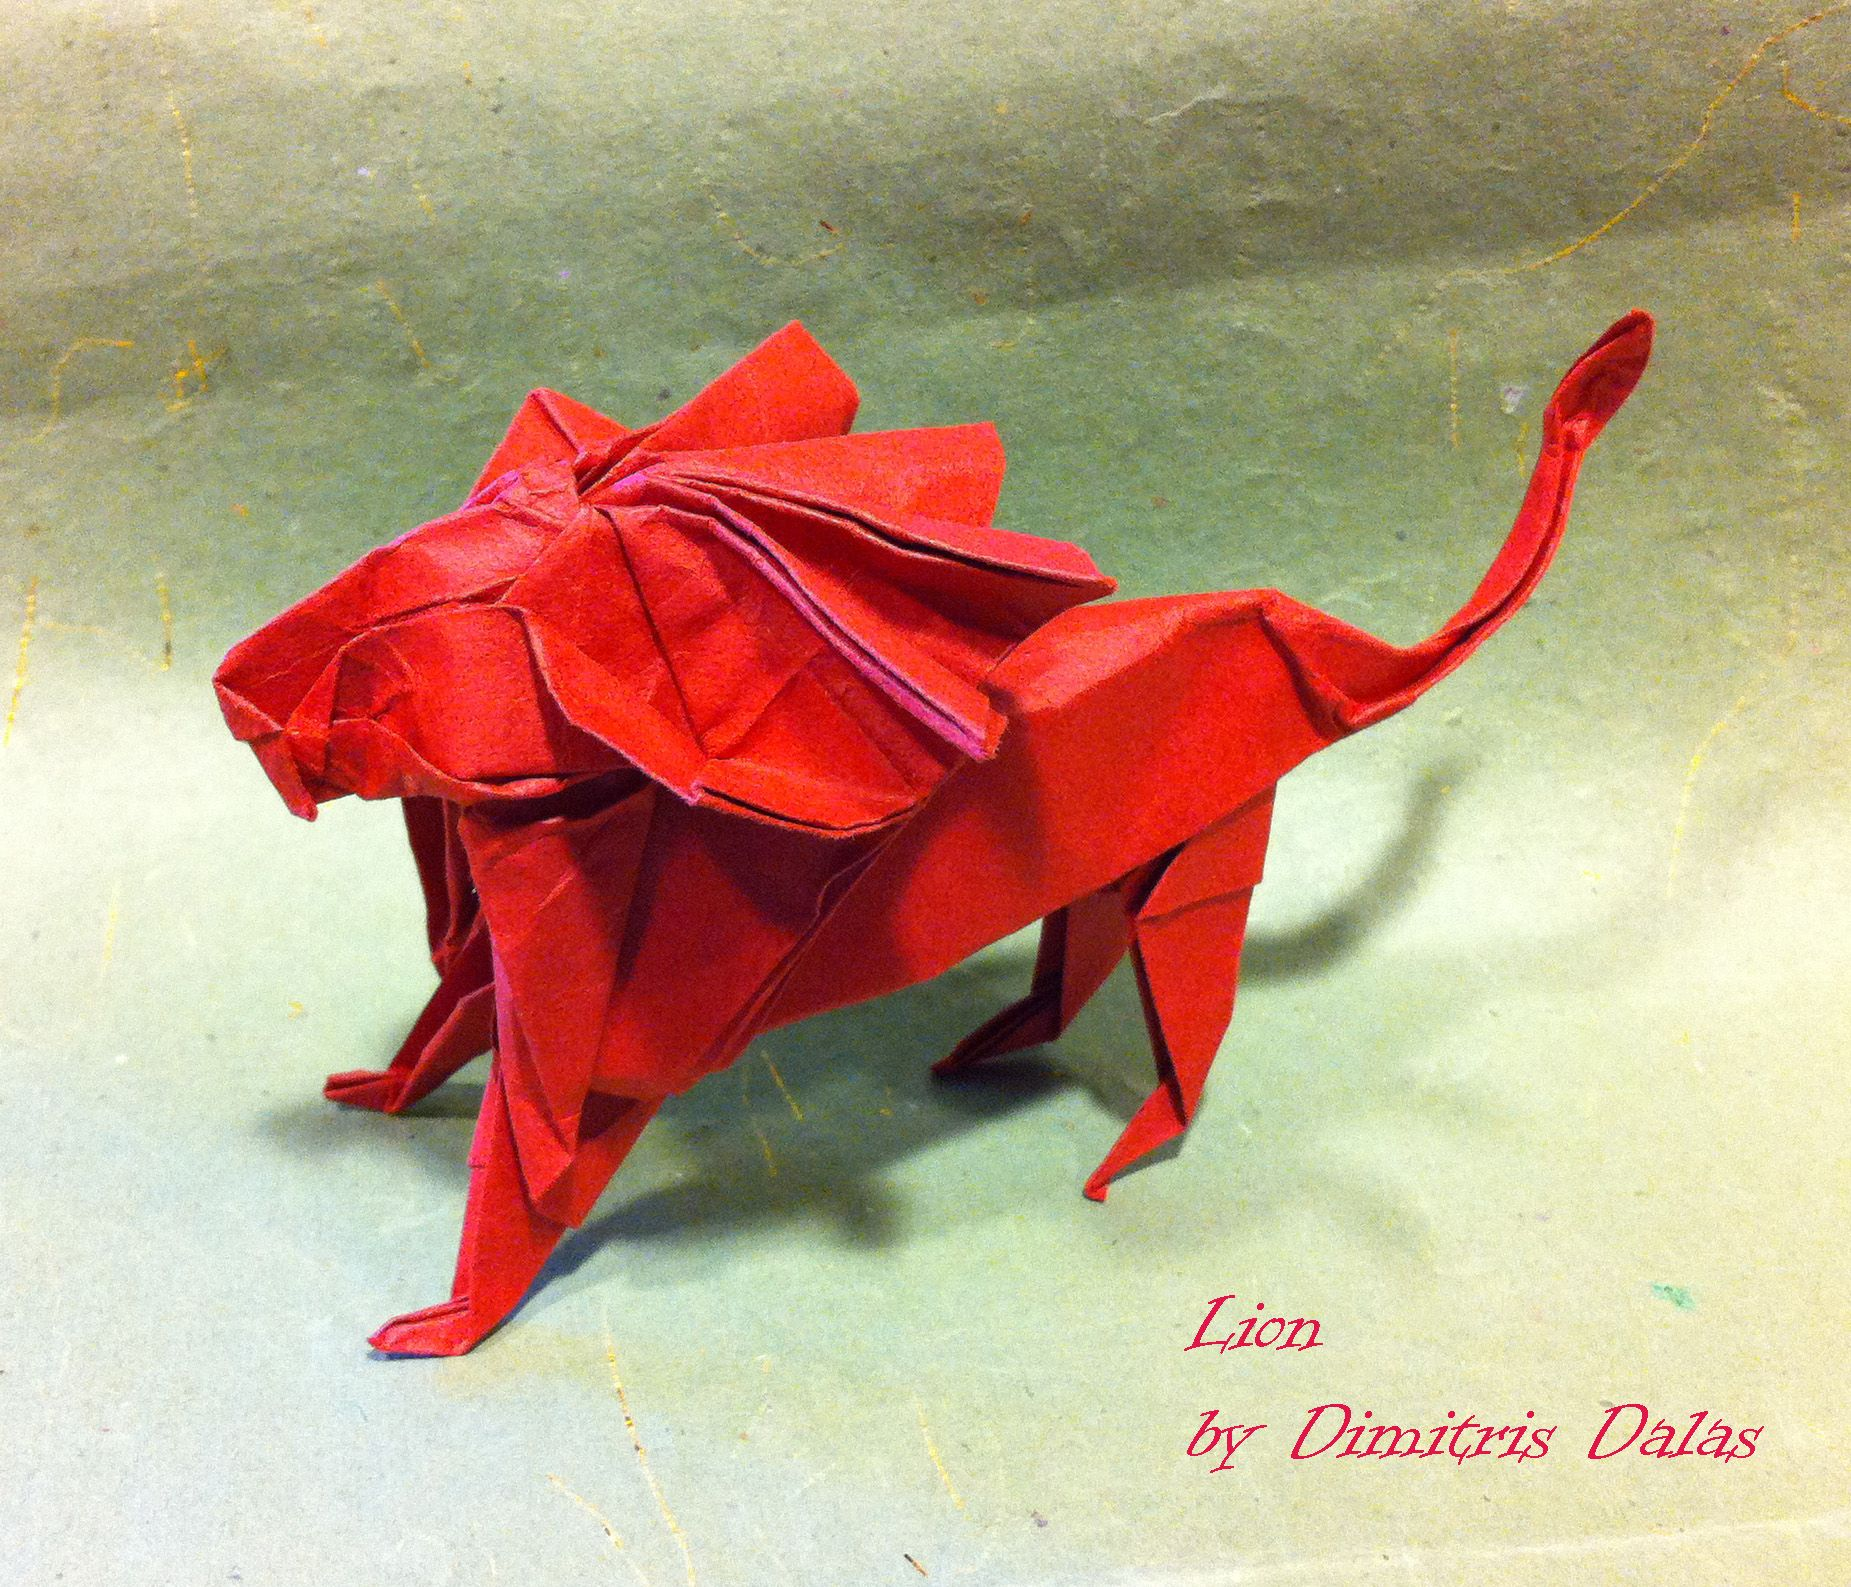 origami lion | origami | Origami, Origami paper art ... - photo#43